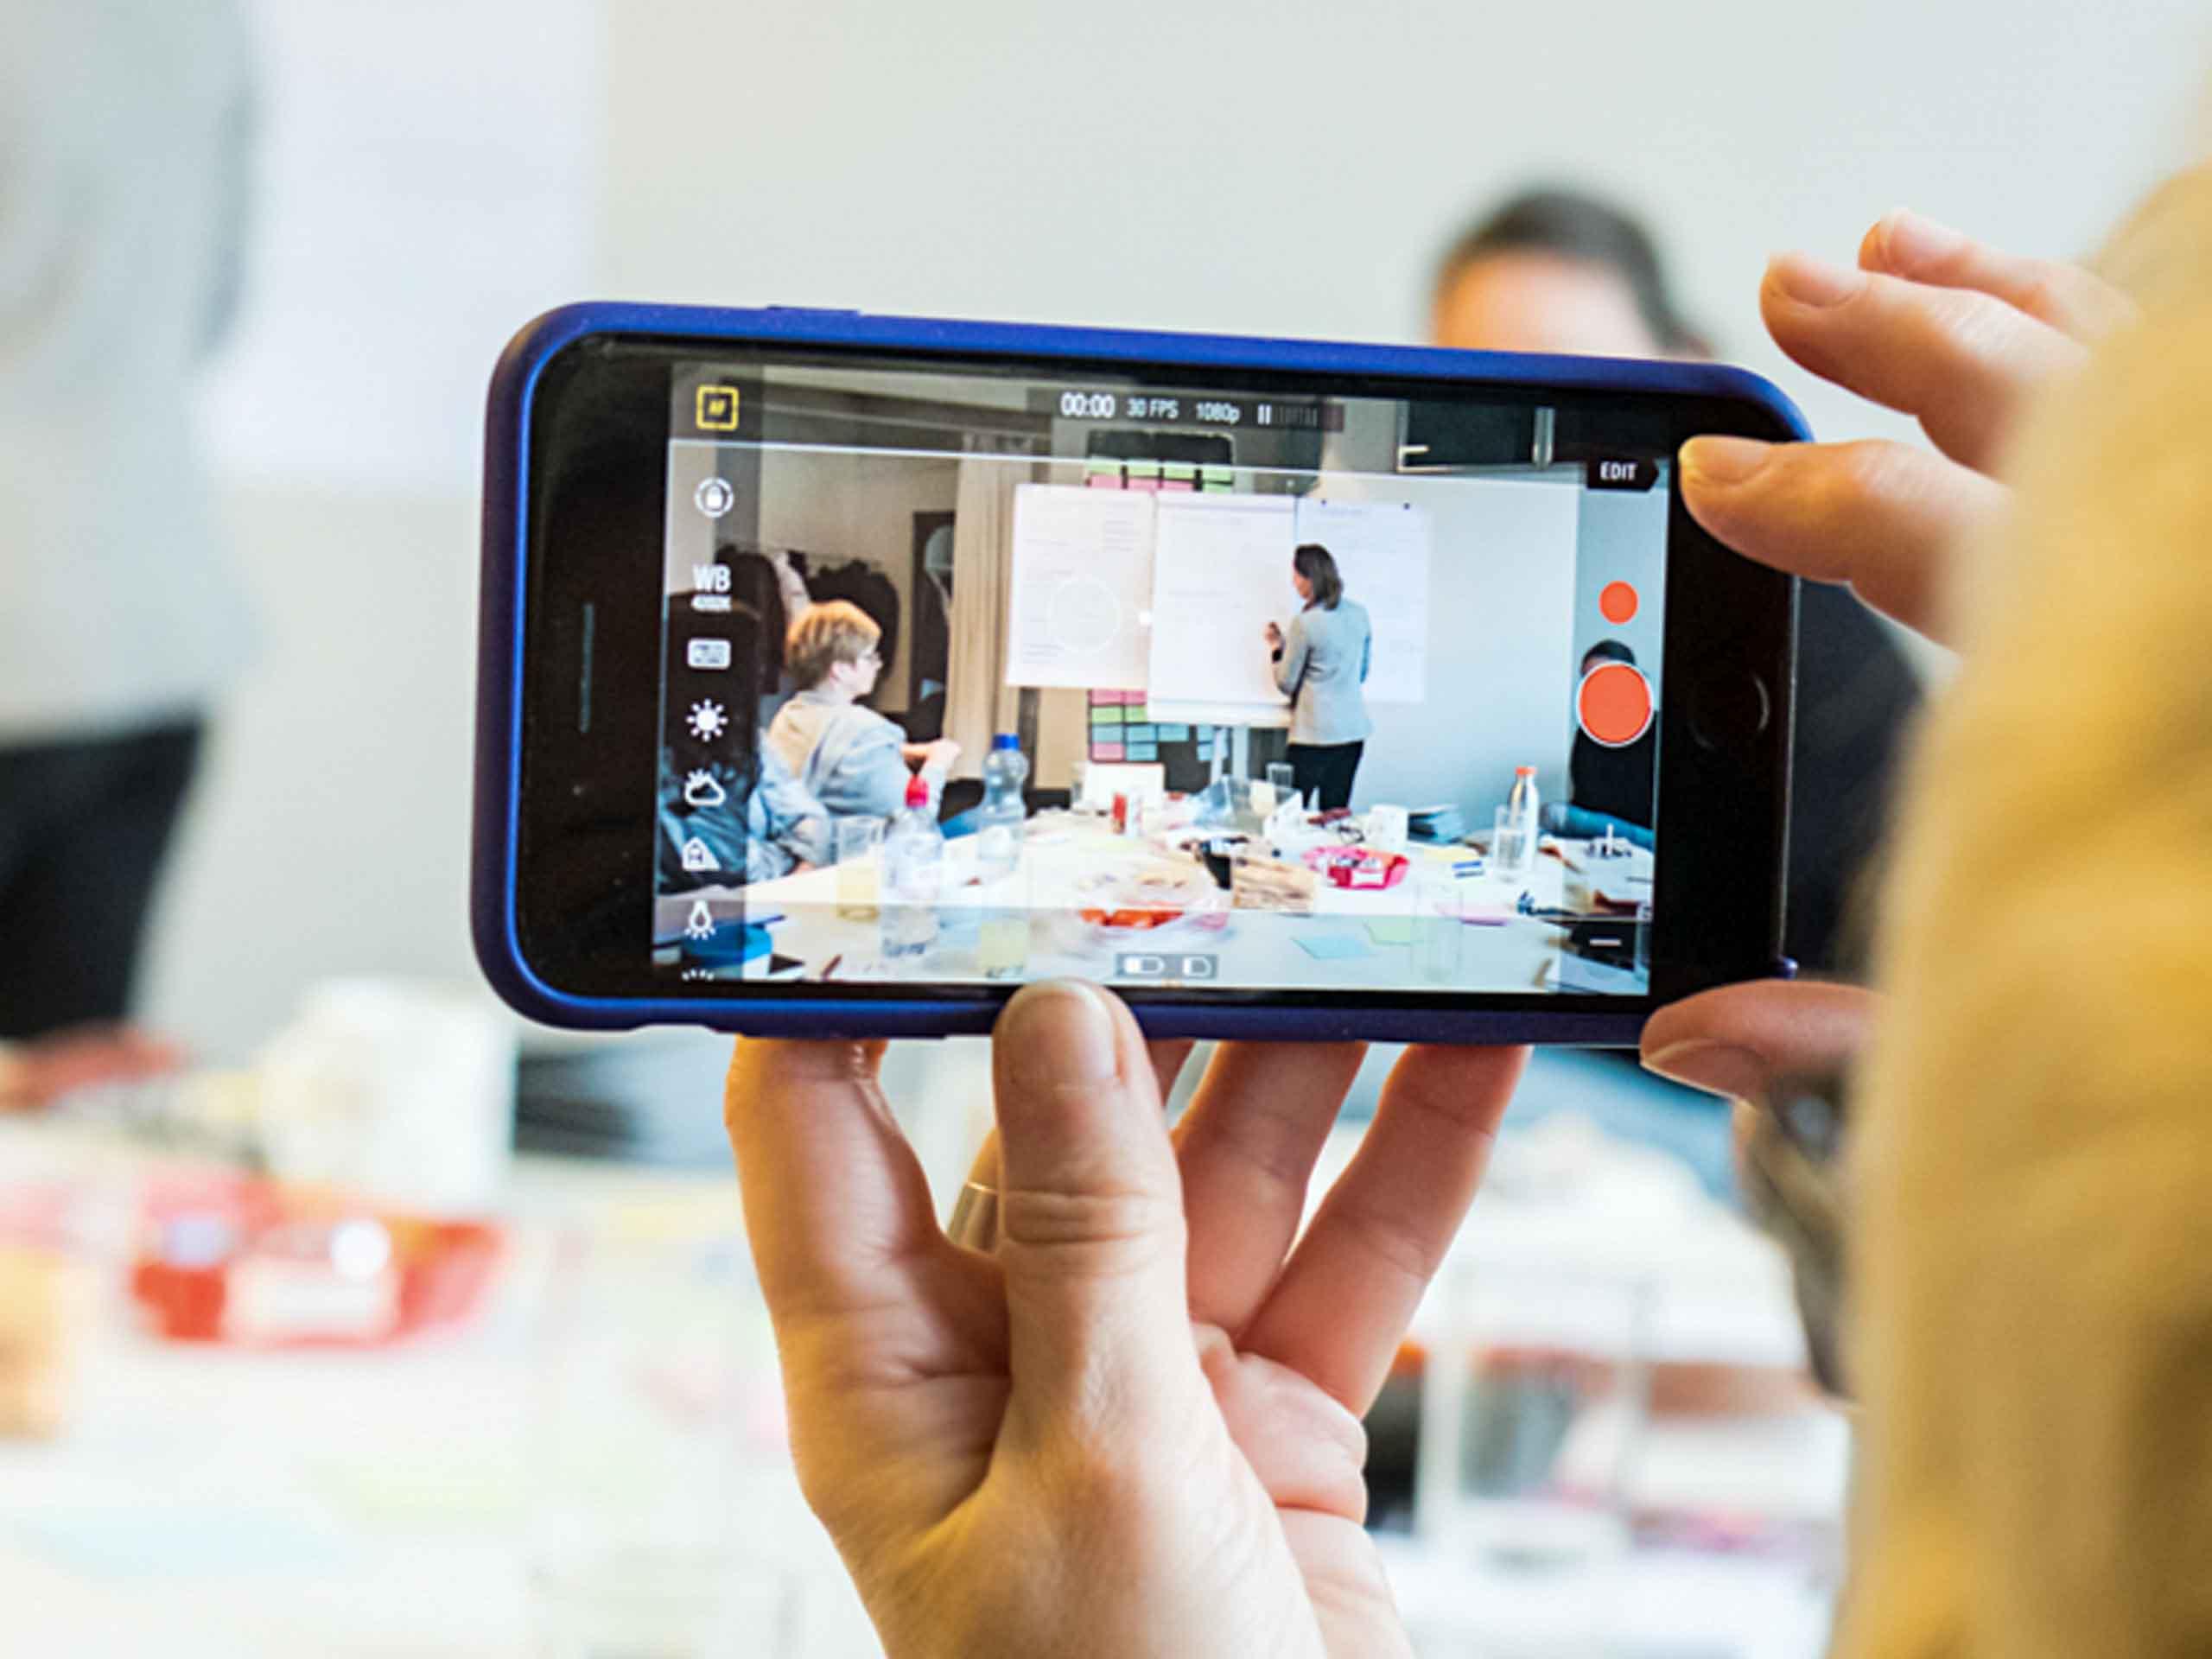 Perfekte Videoclips mit dem Smartphone drehen